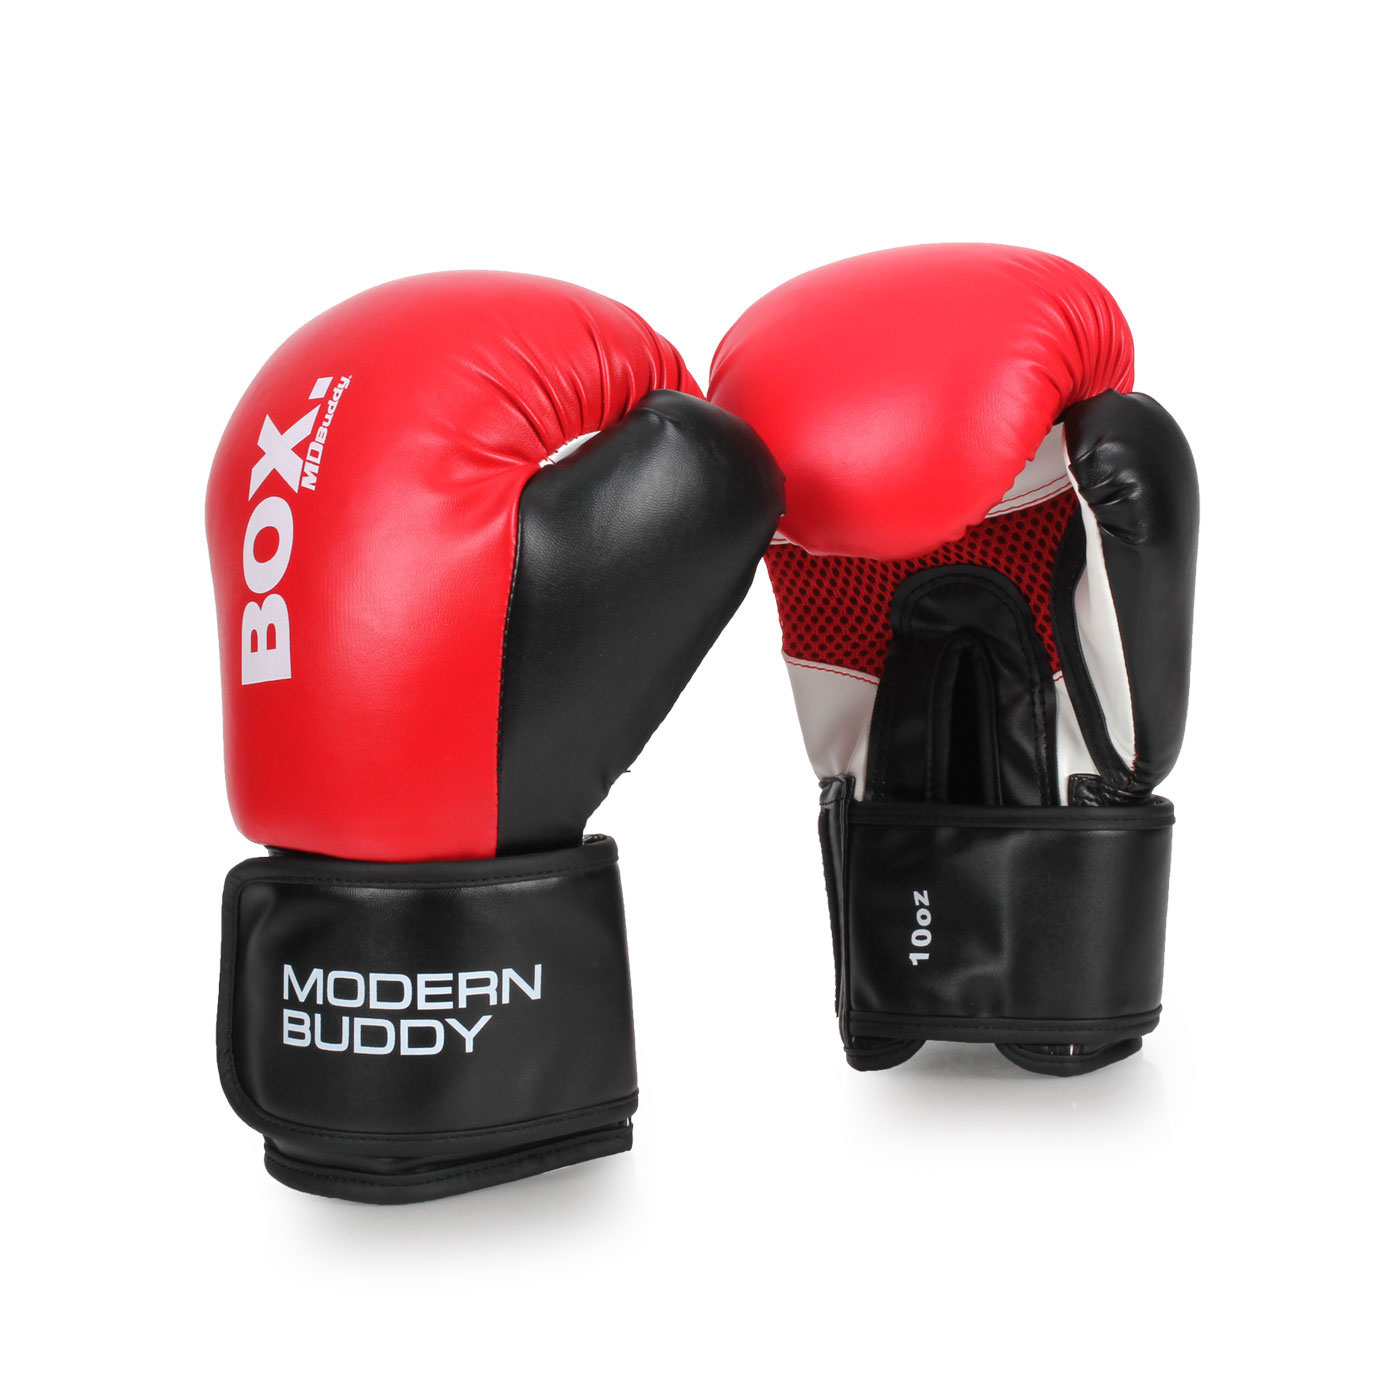 MDBuddy (10oz)拳擊手套 6025301 - 隨機